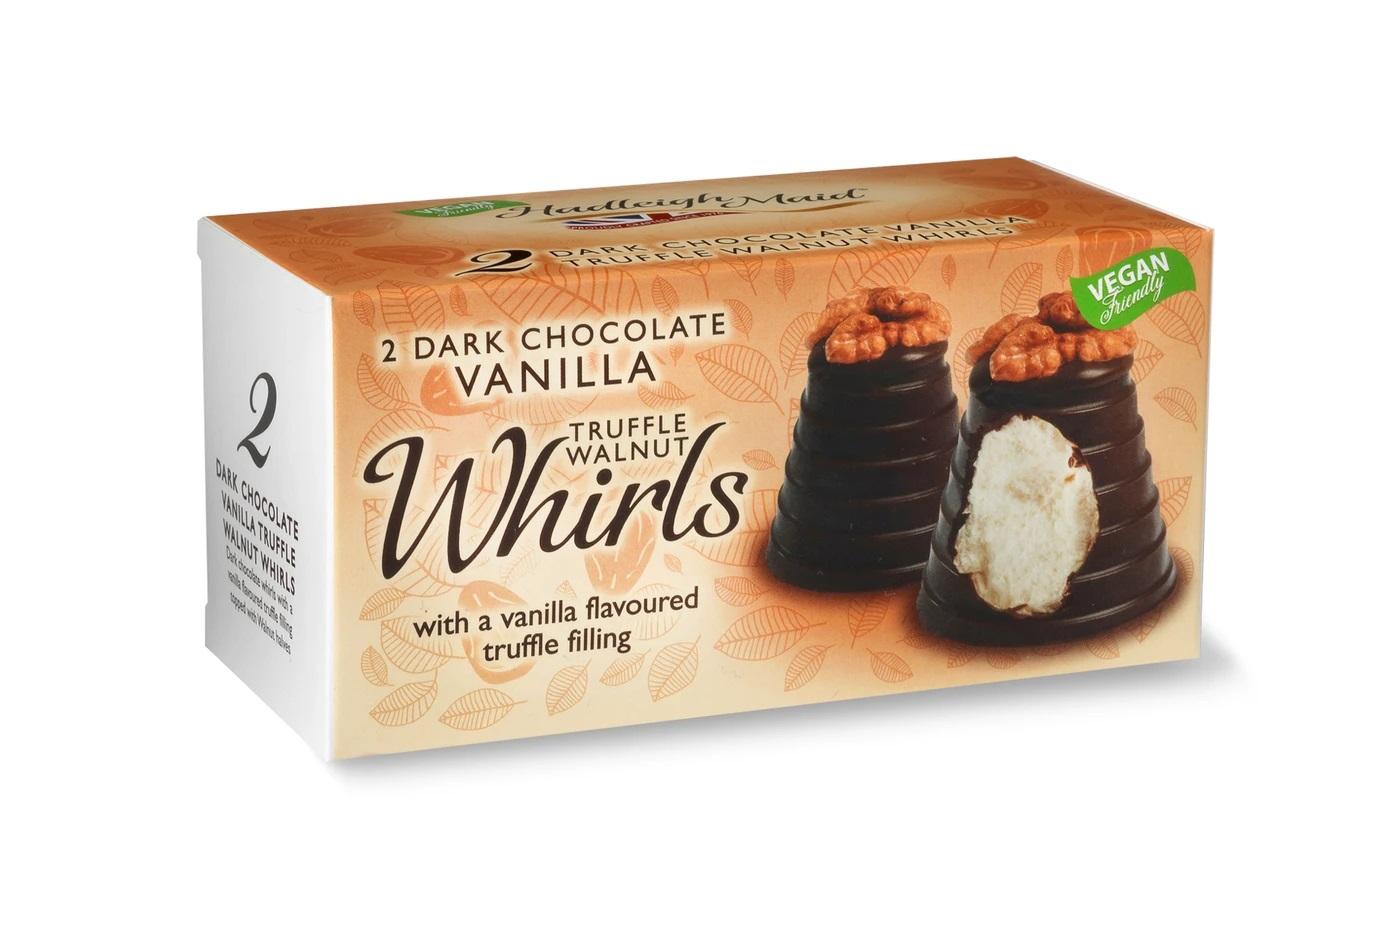 Hadleigh Maid's Dark Chocolate Walnut & Mallow Whirls